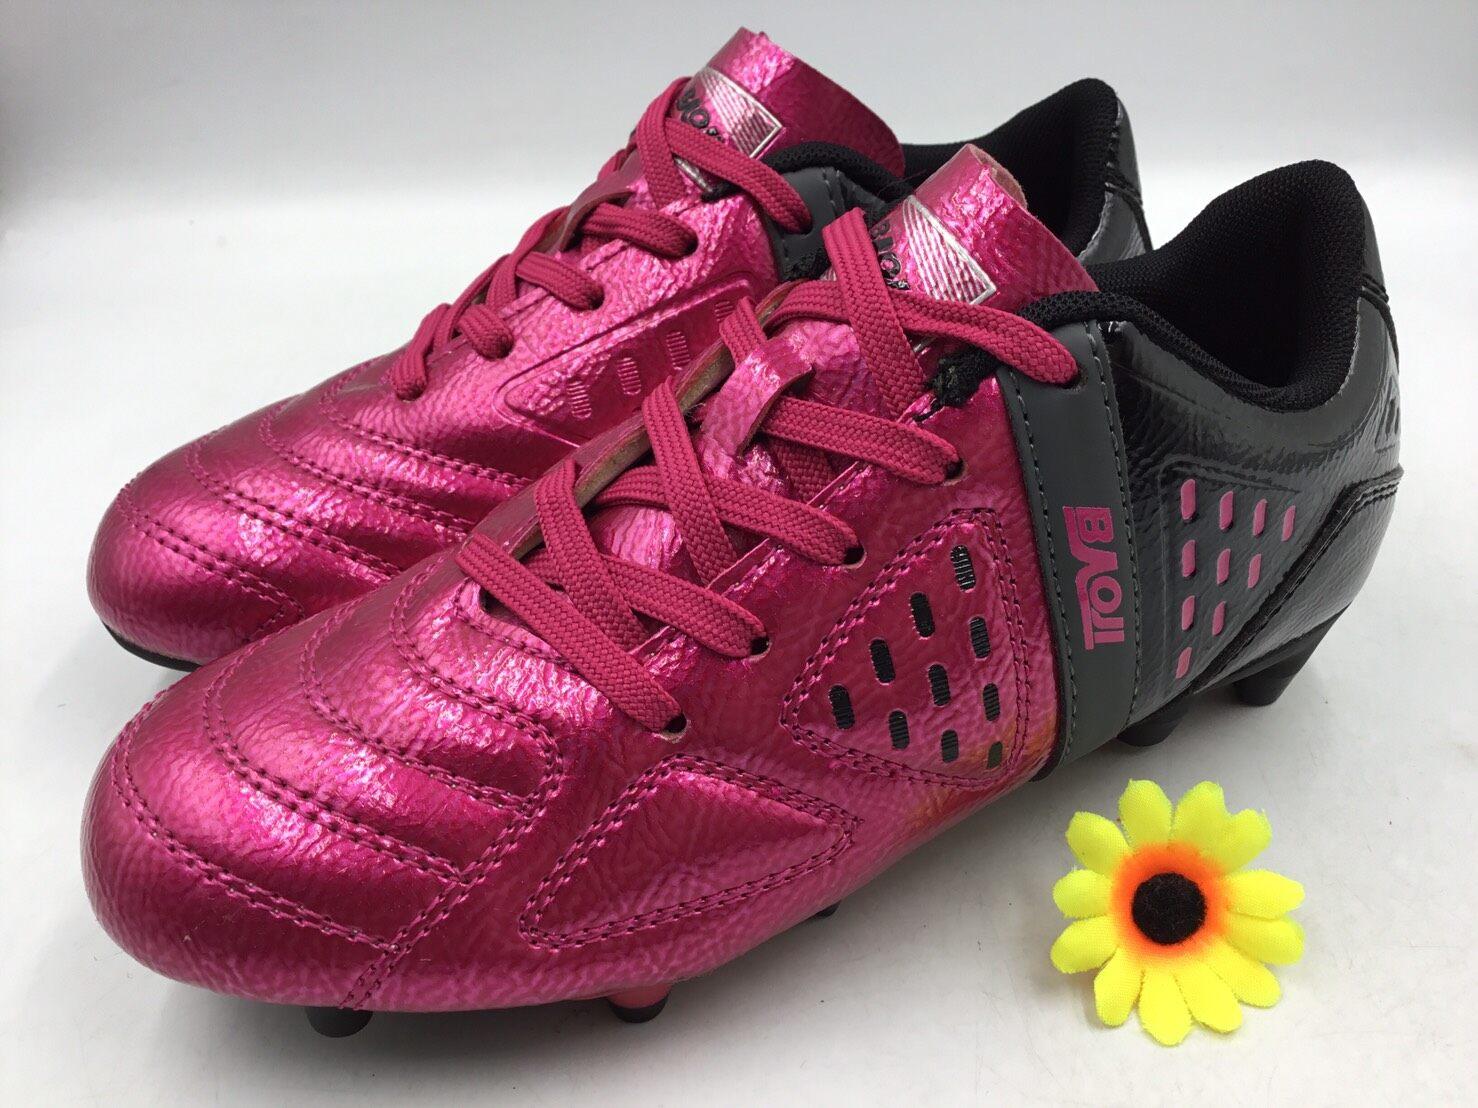 BAOJI รุ่นGH817 รองเท้าสตั๊คเด็ก